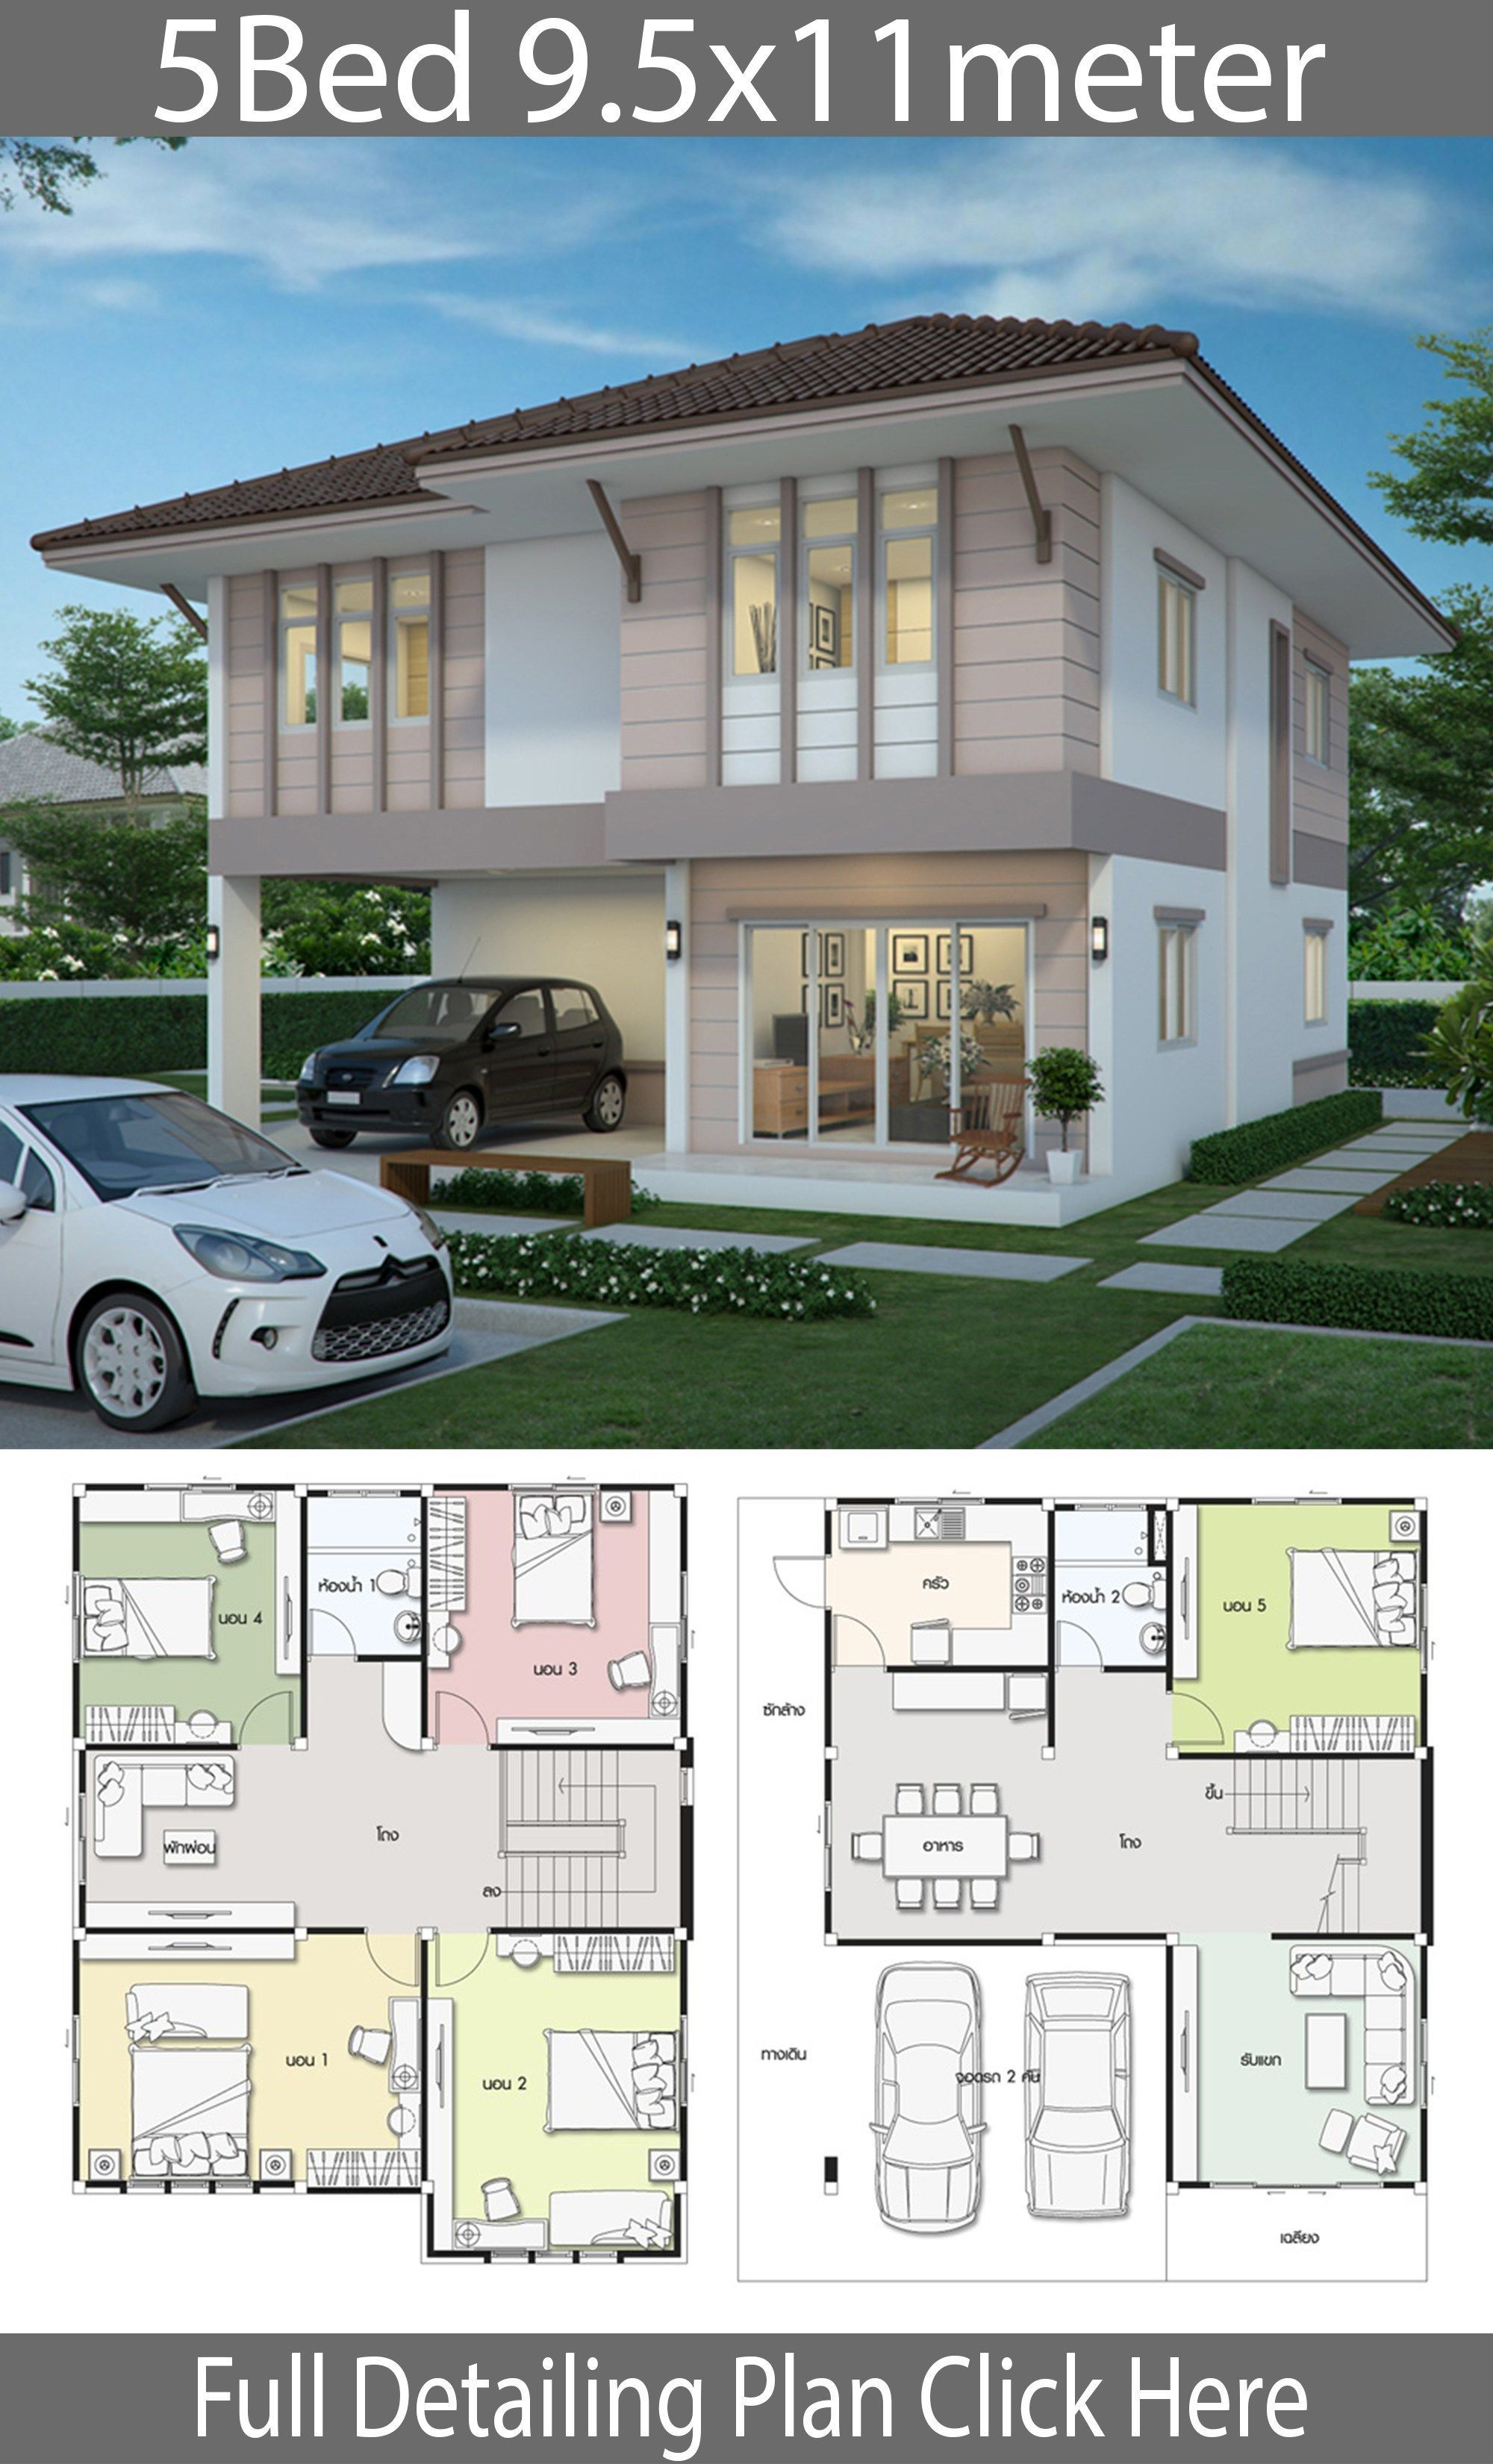 House Design Plan 9 5x11m With 5 Bedrooms 5 9 5x11m Bedrooms Design House Plan With House Blueprints Ev Zemin Planlari Modern Ev Tasarimi